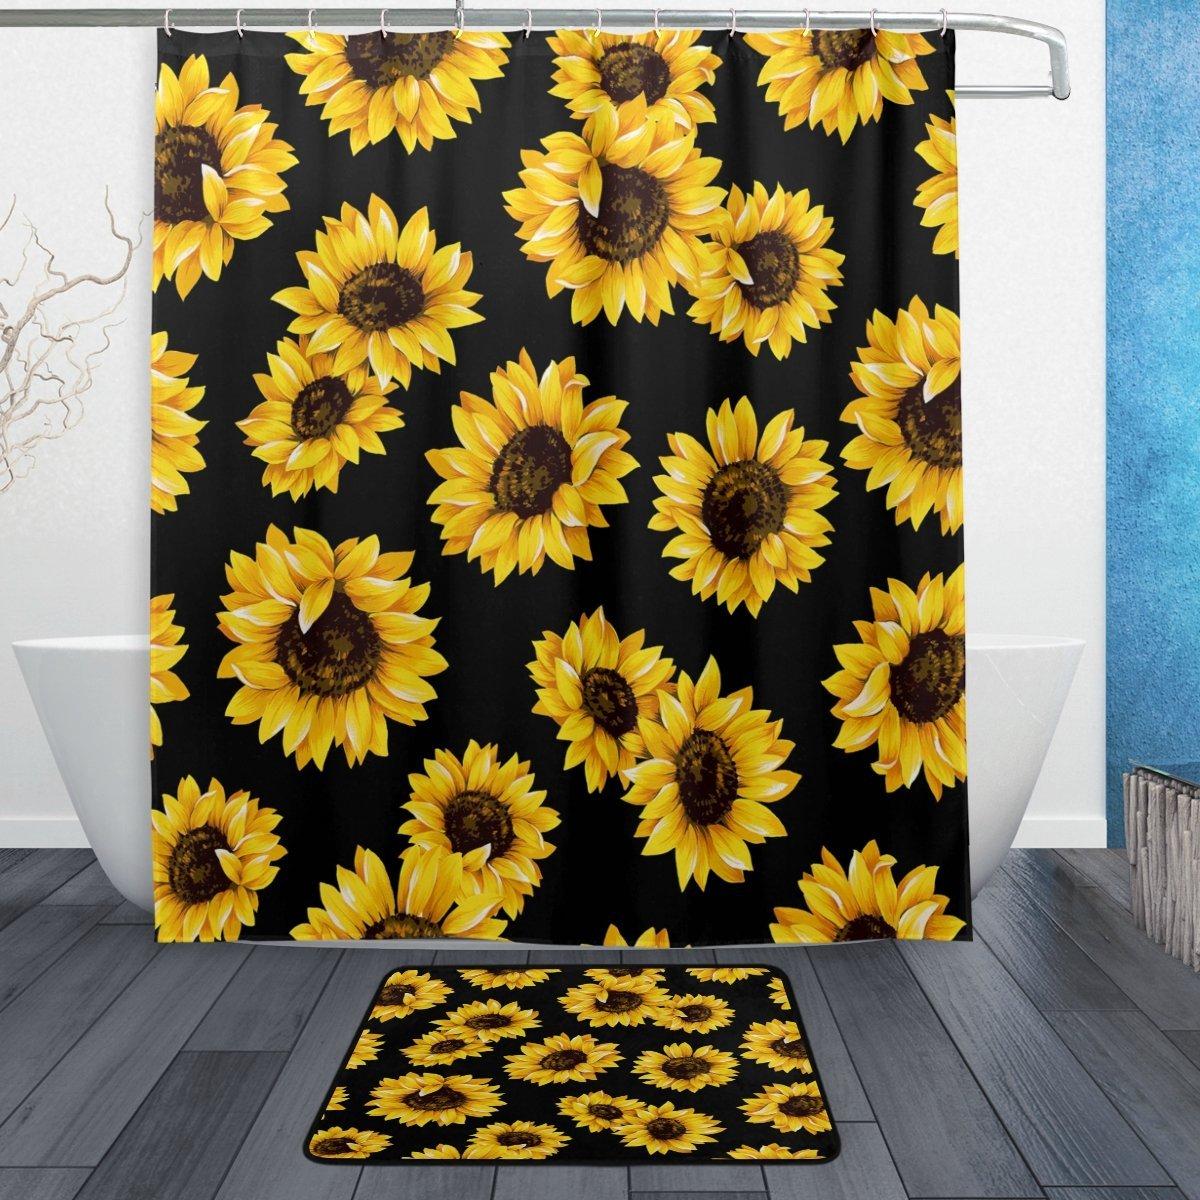 Us 18 39 20 Off Vintage Sunflower Flower Waterproof Polyester Fabric Shower Curtain With Hooks Doormat Bath Floor Mat Bathroom Home Decor In Shower